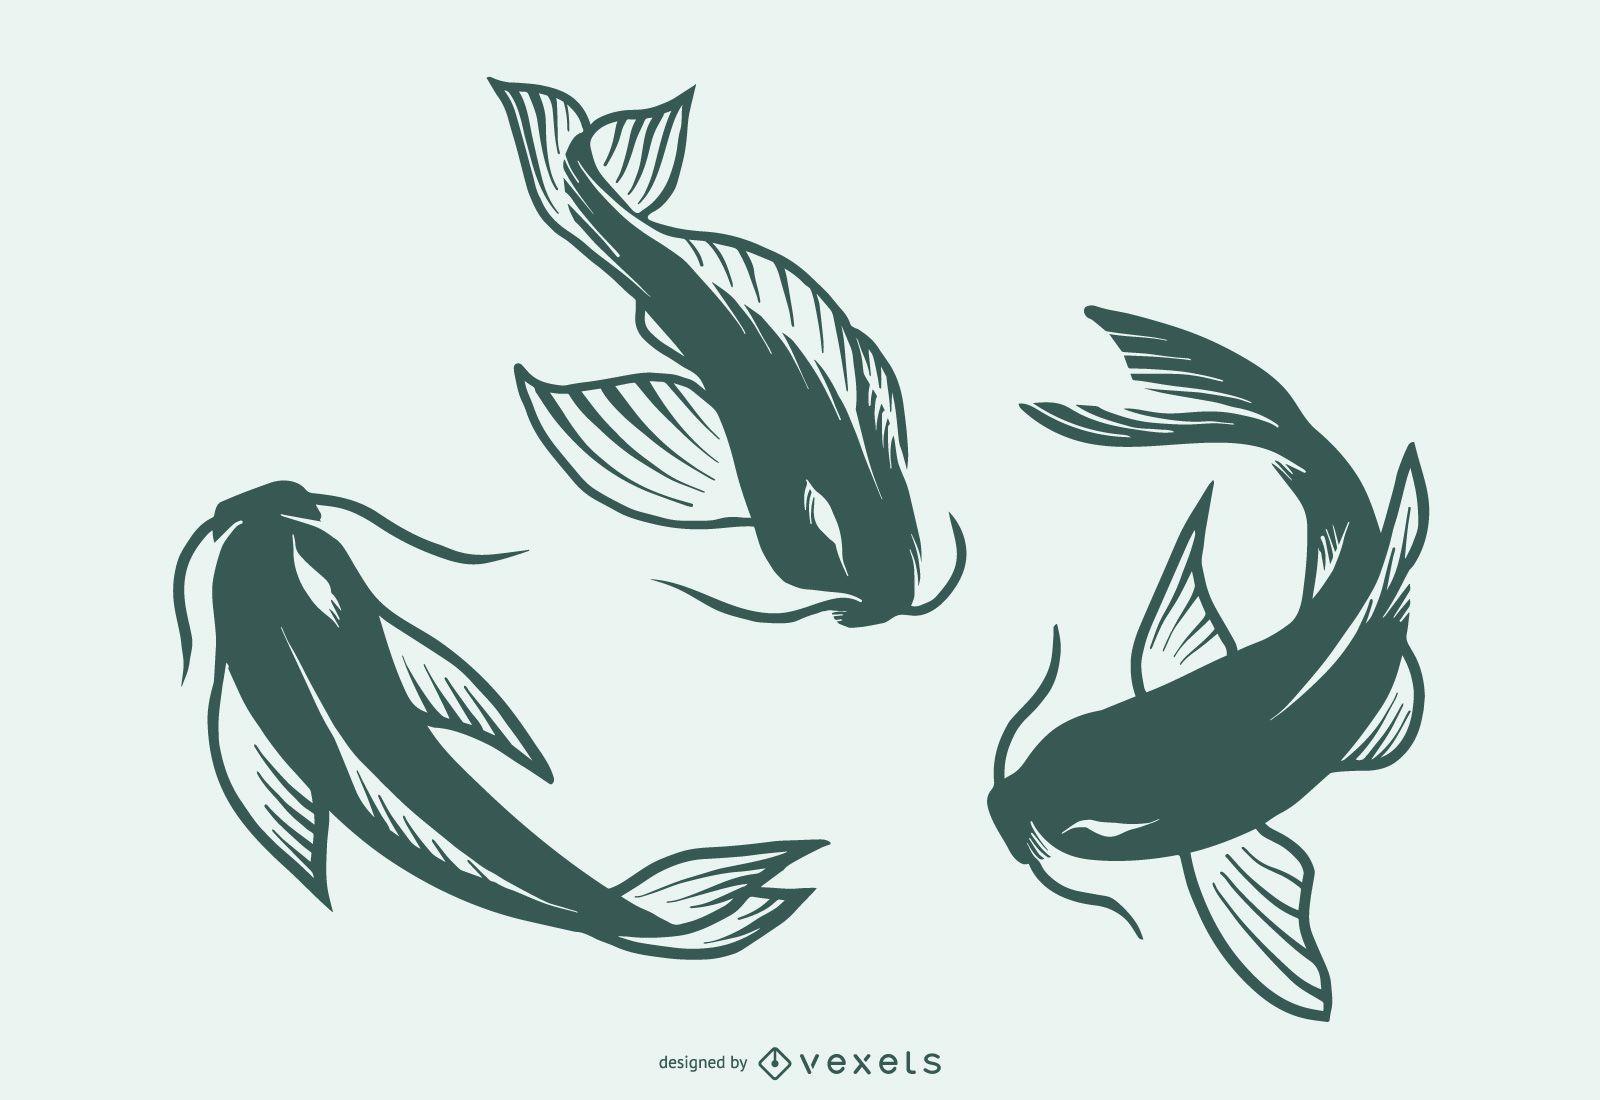 Fish Silhouette Tattoo Design Collection